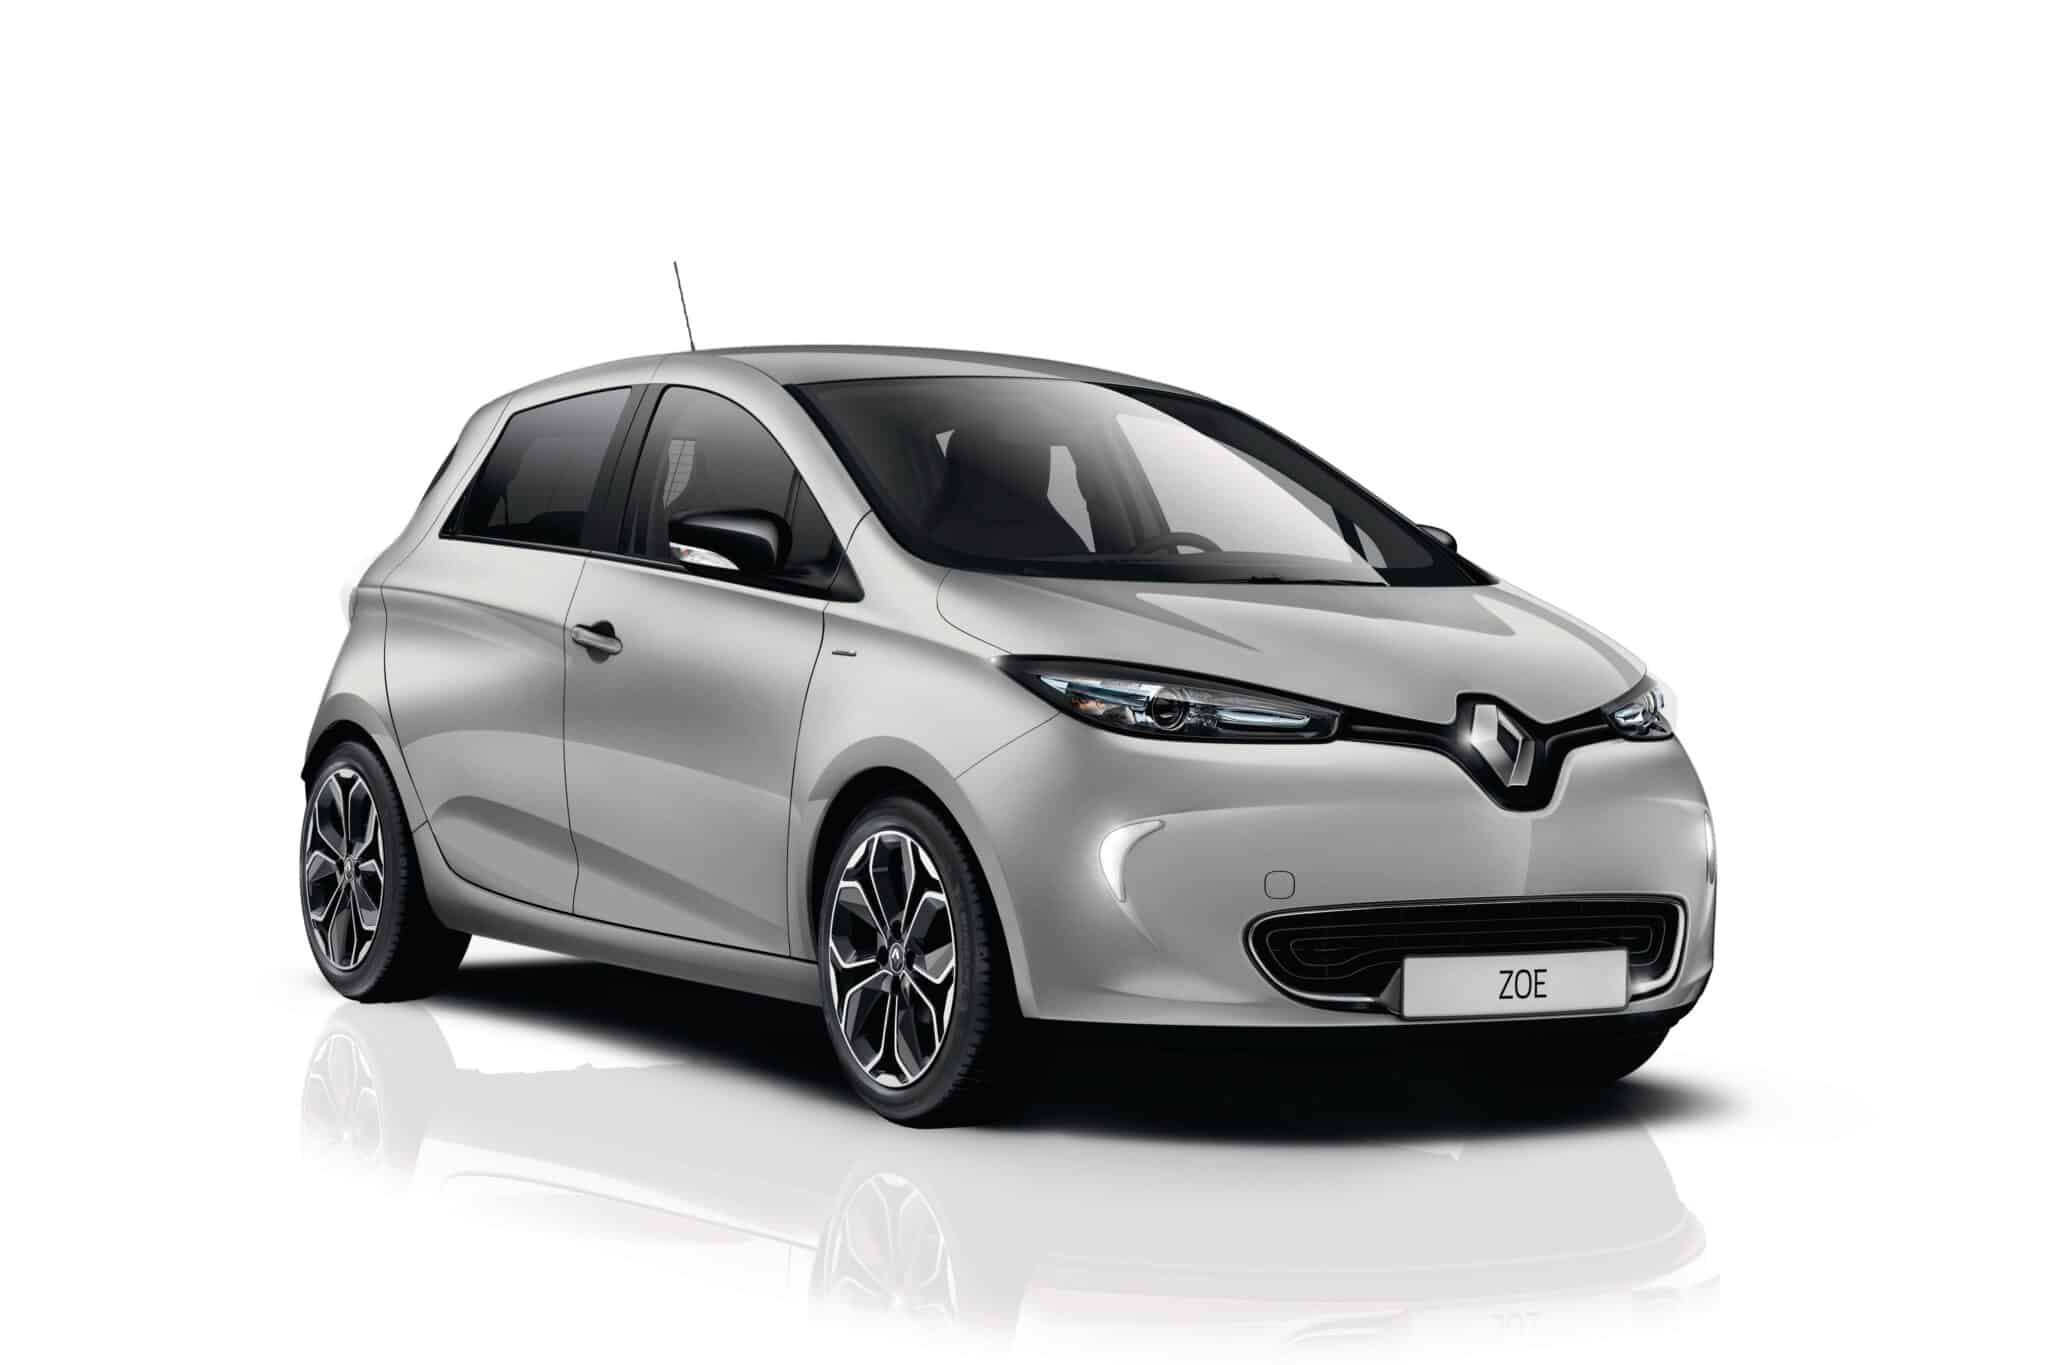 Renault ZOE mit neuer Sonderedition LUNA » 20352 21216711 2018   Renault ZOE   ICONIC Limited Edition